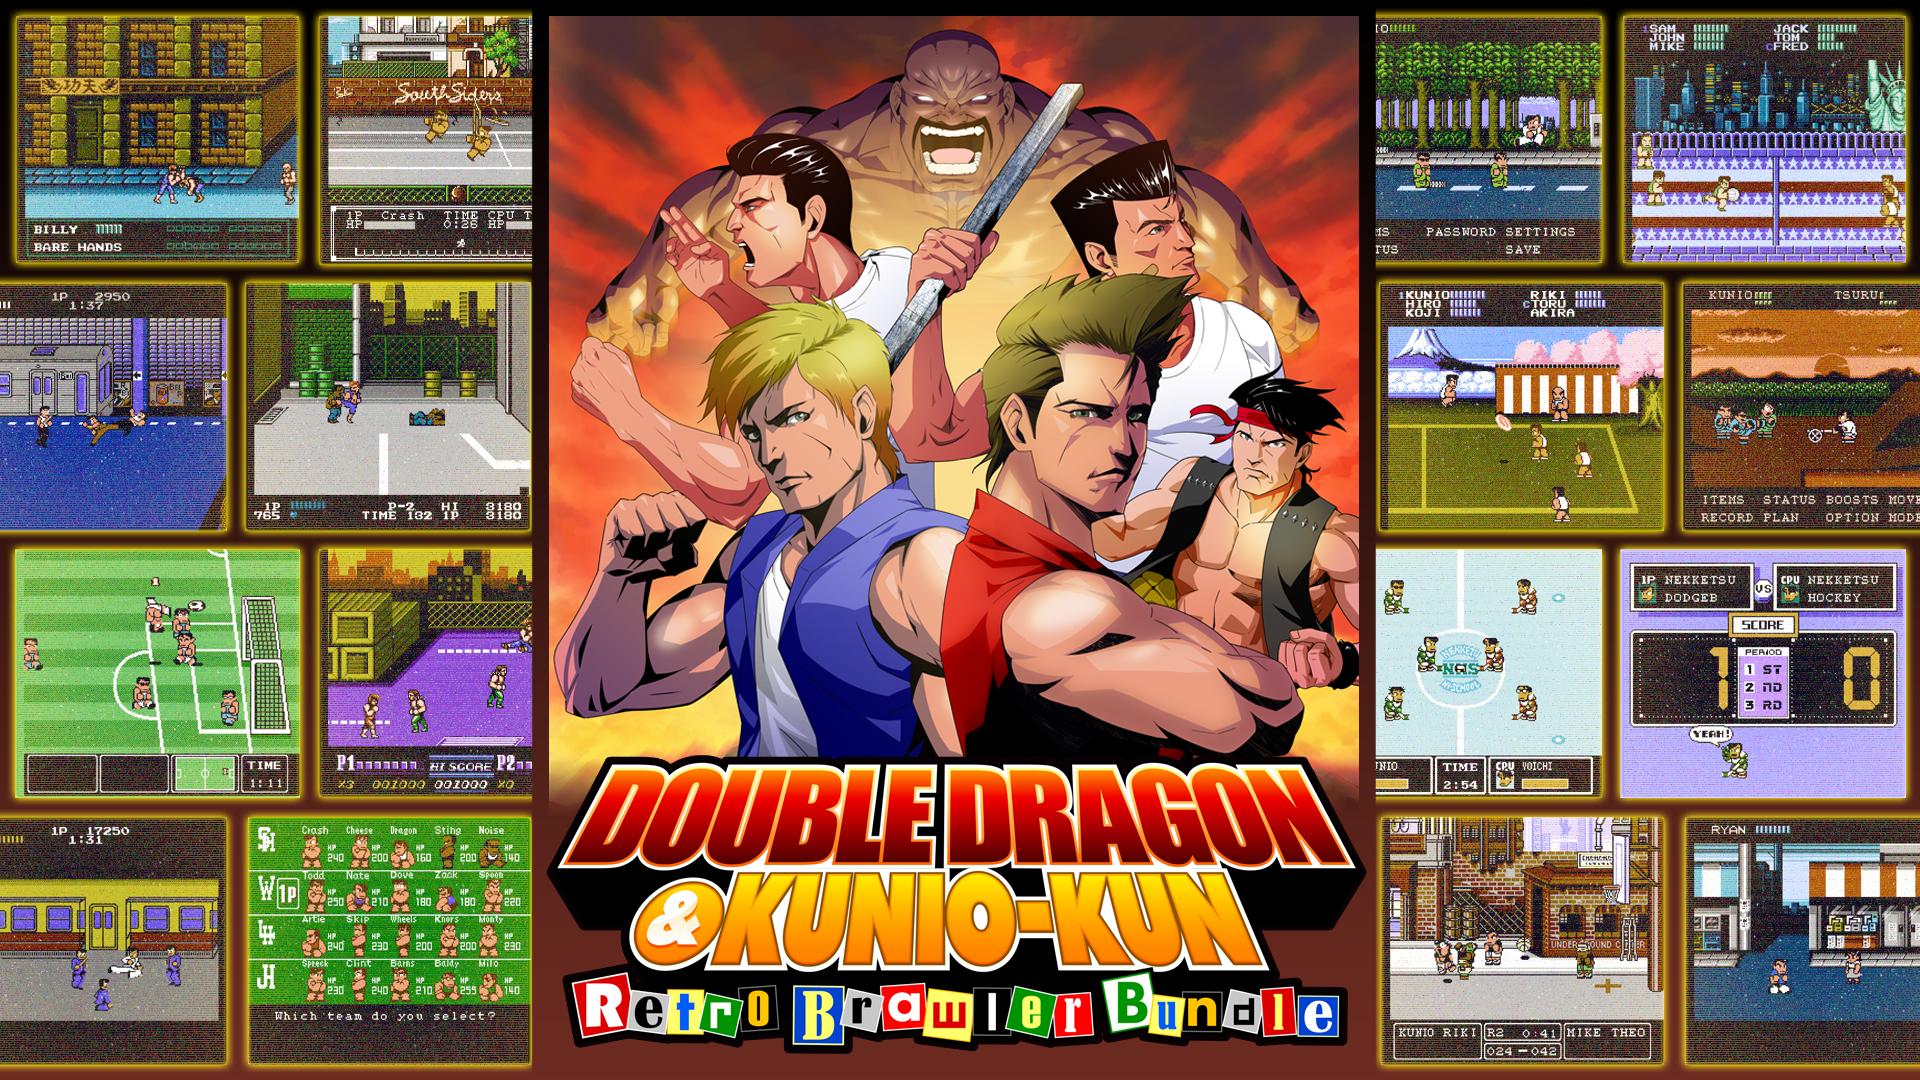 Double Dragon & Kunio-kun: Retro Brawler Bundle - Nintendo Switch Digital Download - $19.60 @ Nintendo Game Store